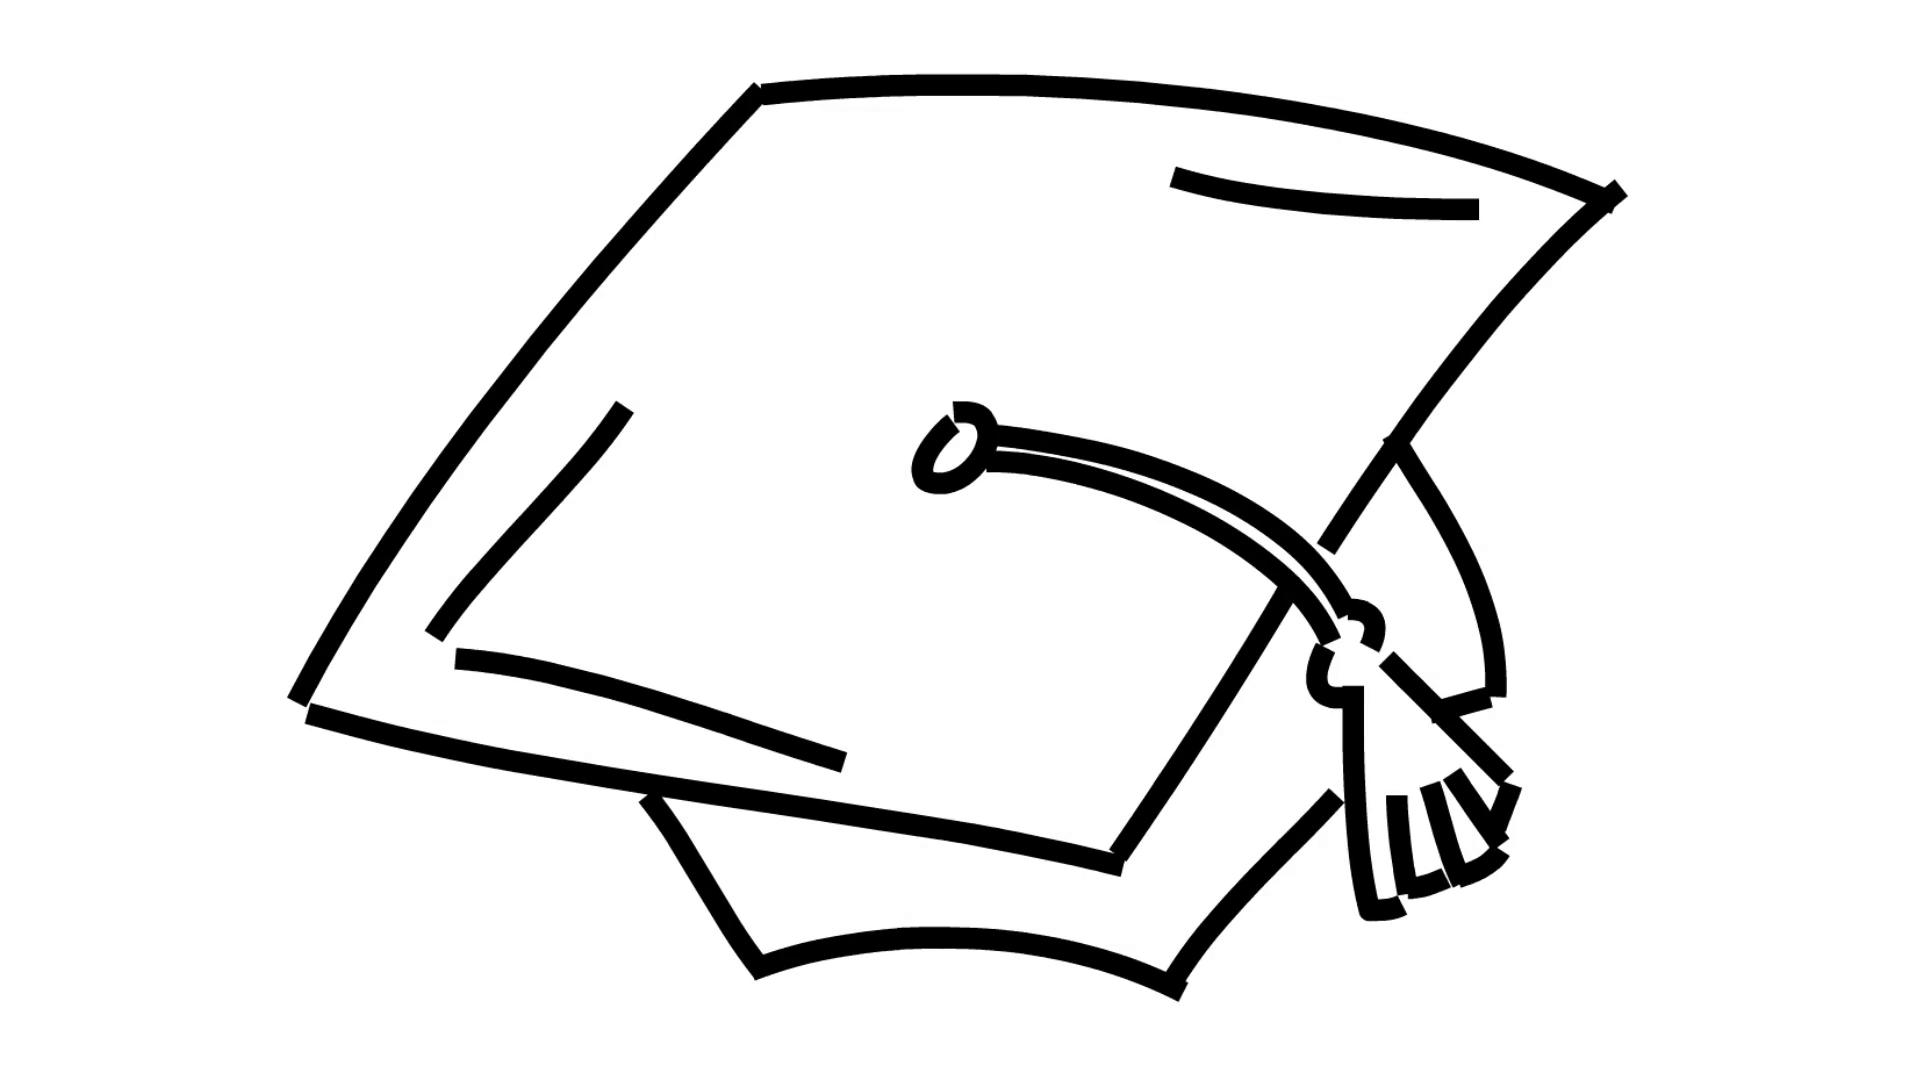 1920x1080 Graduation Hat Line Drawing Illustration Animation